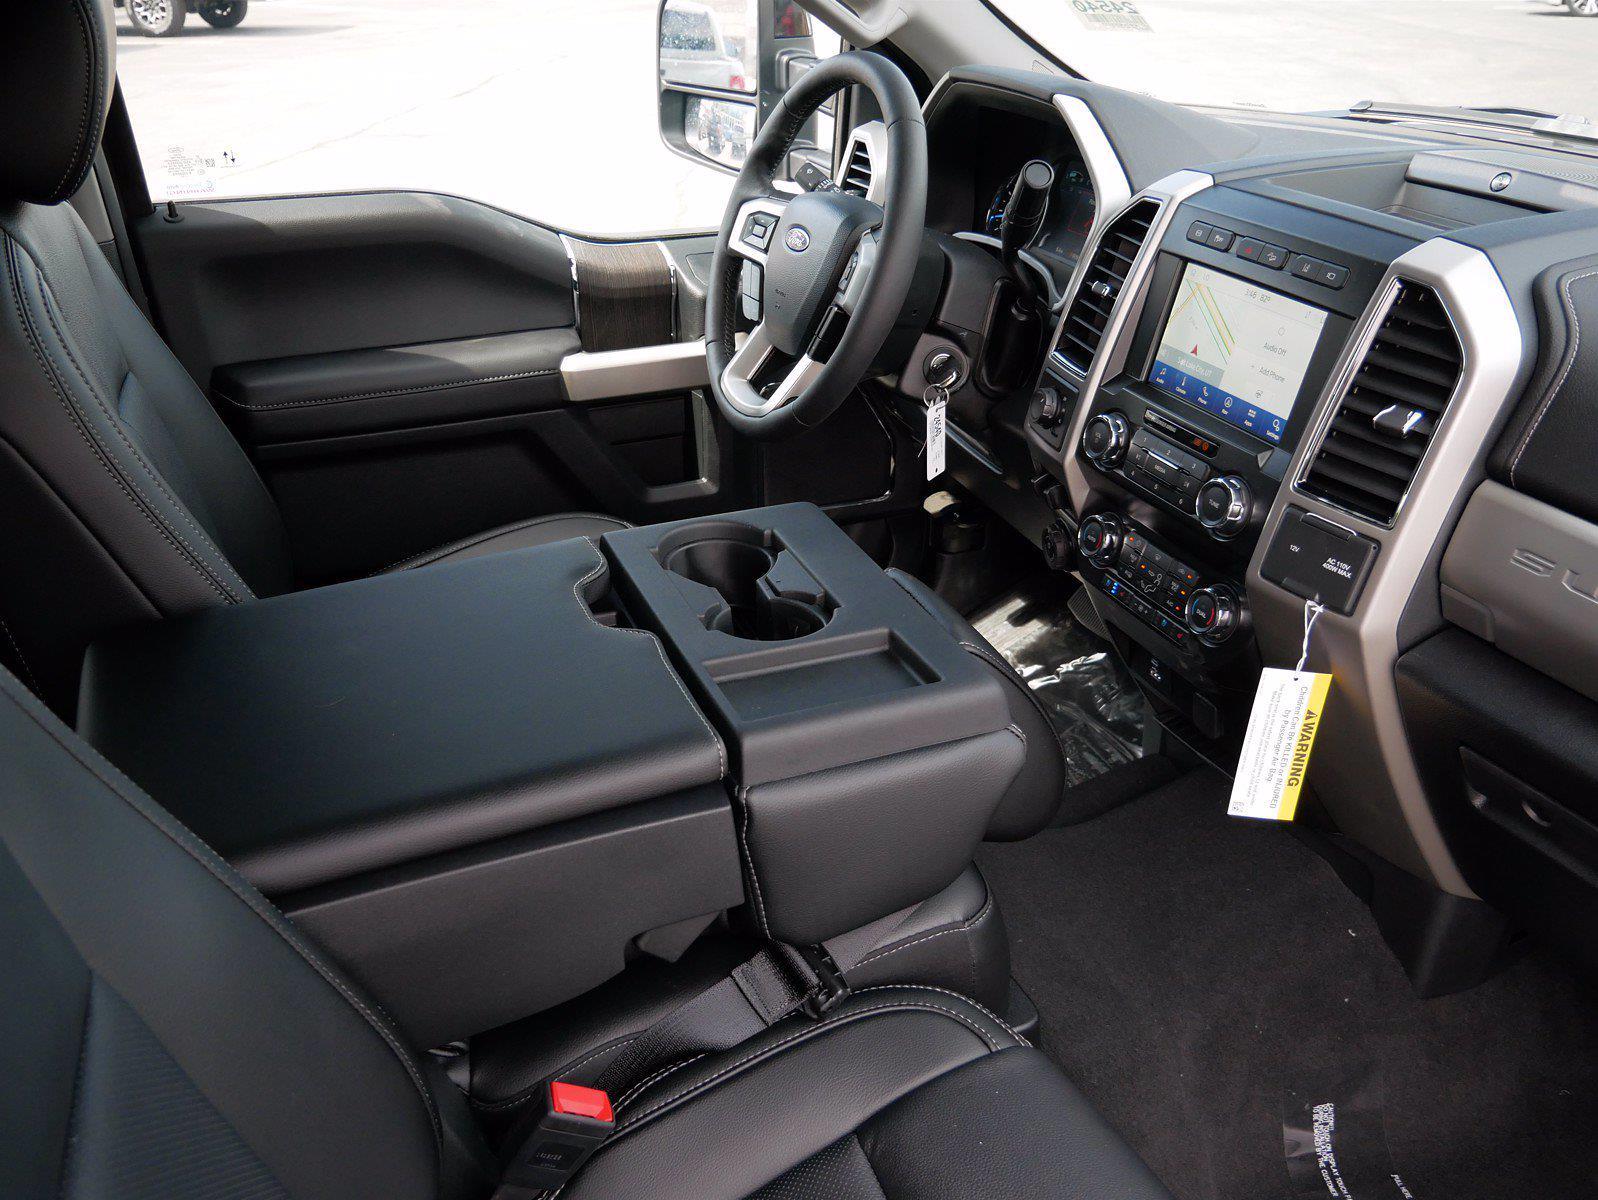 2021 Ford F-350 Crew Cab 4x4, Pickup #24540 - photo 30